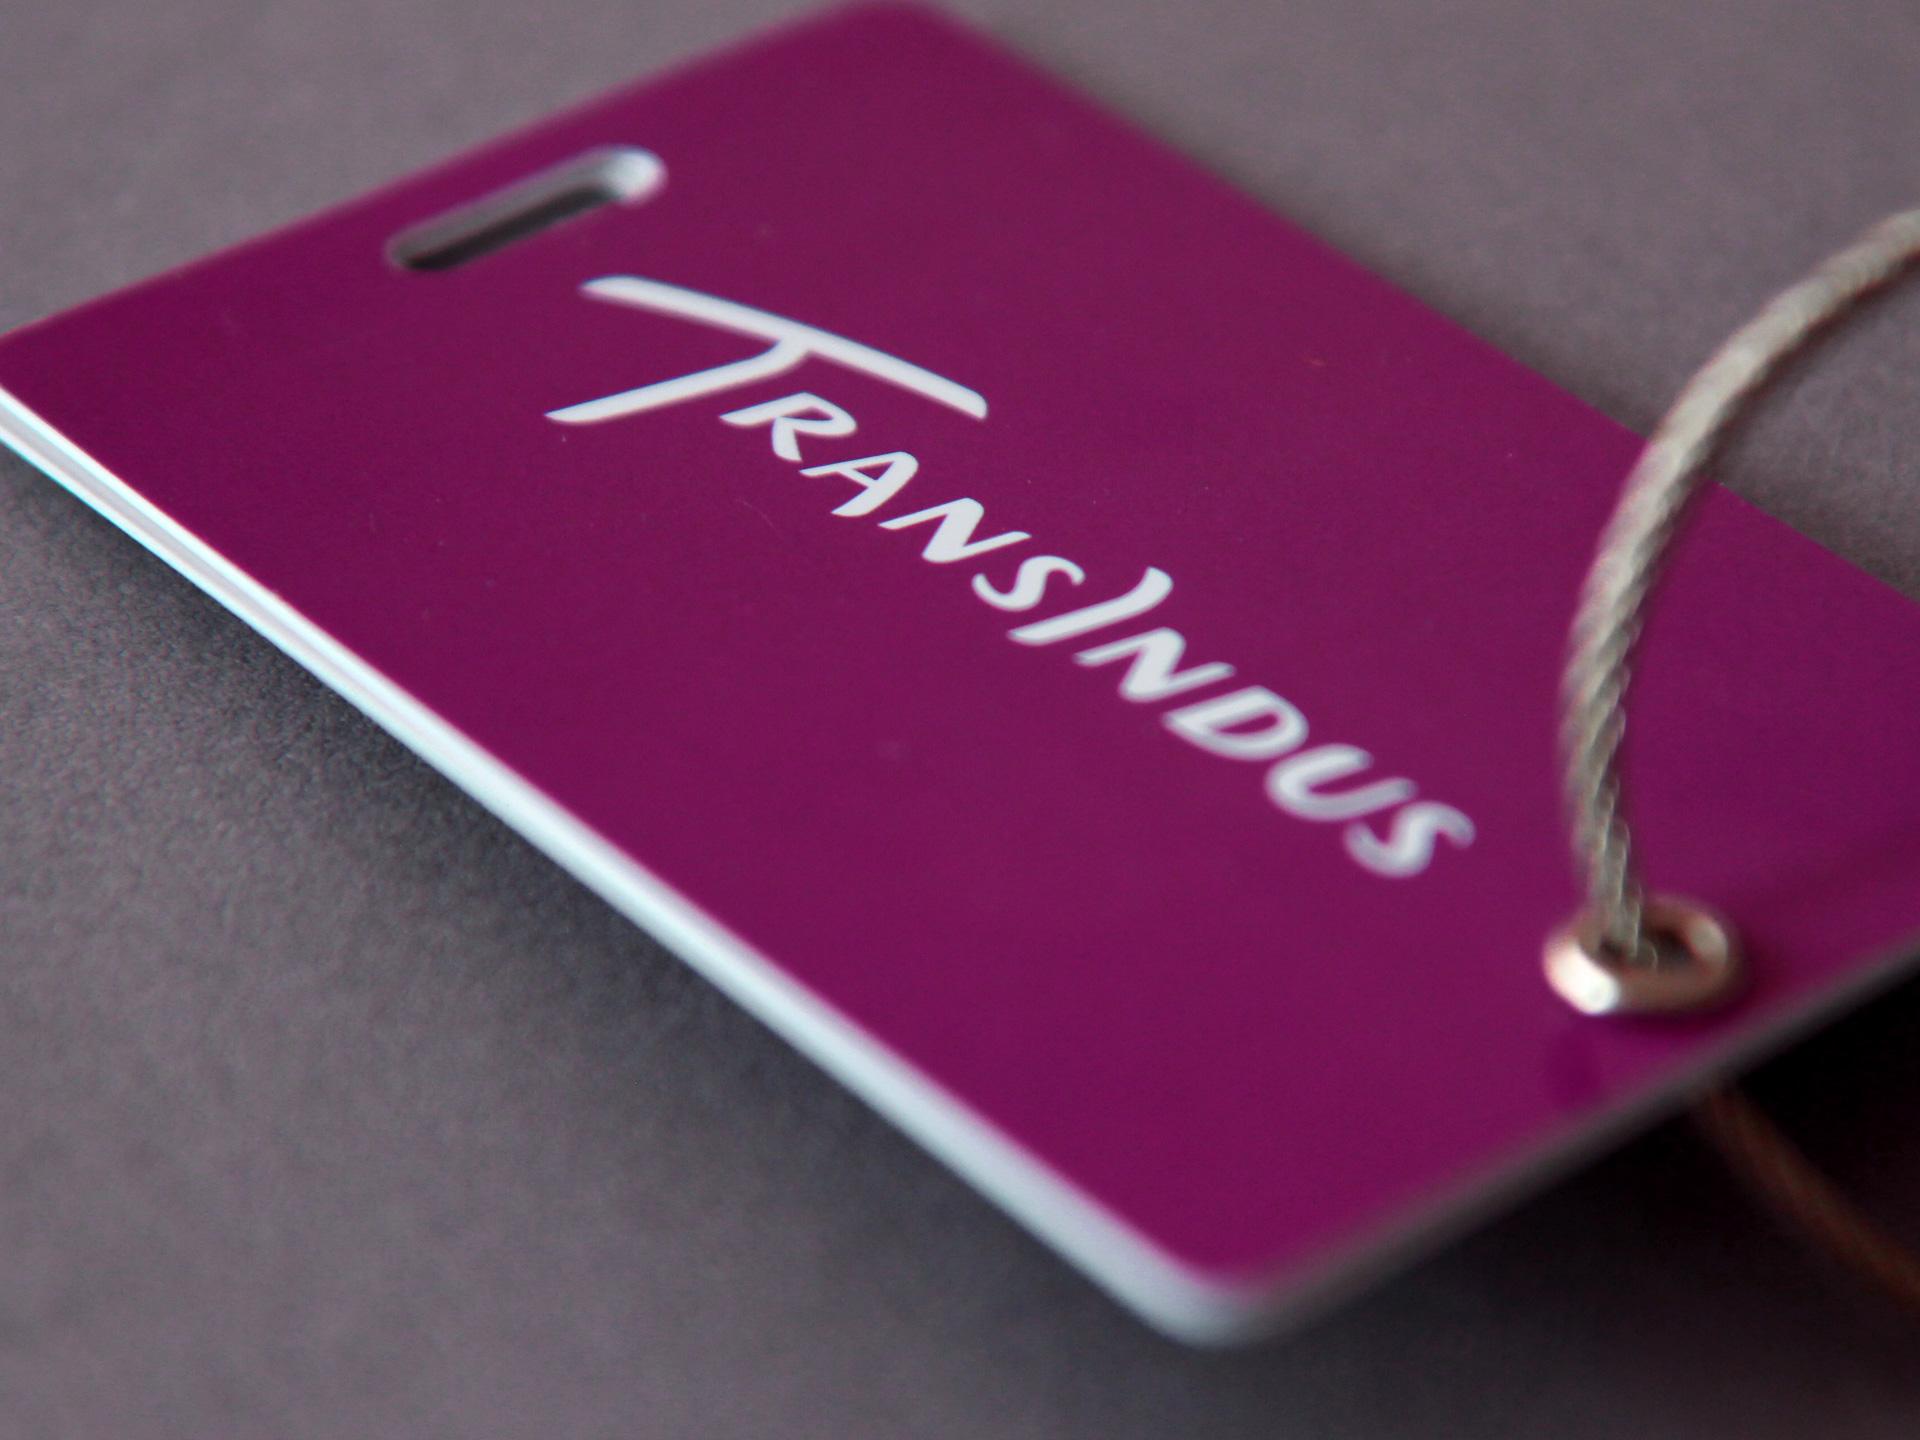 Transindus identity